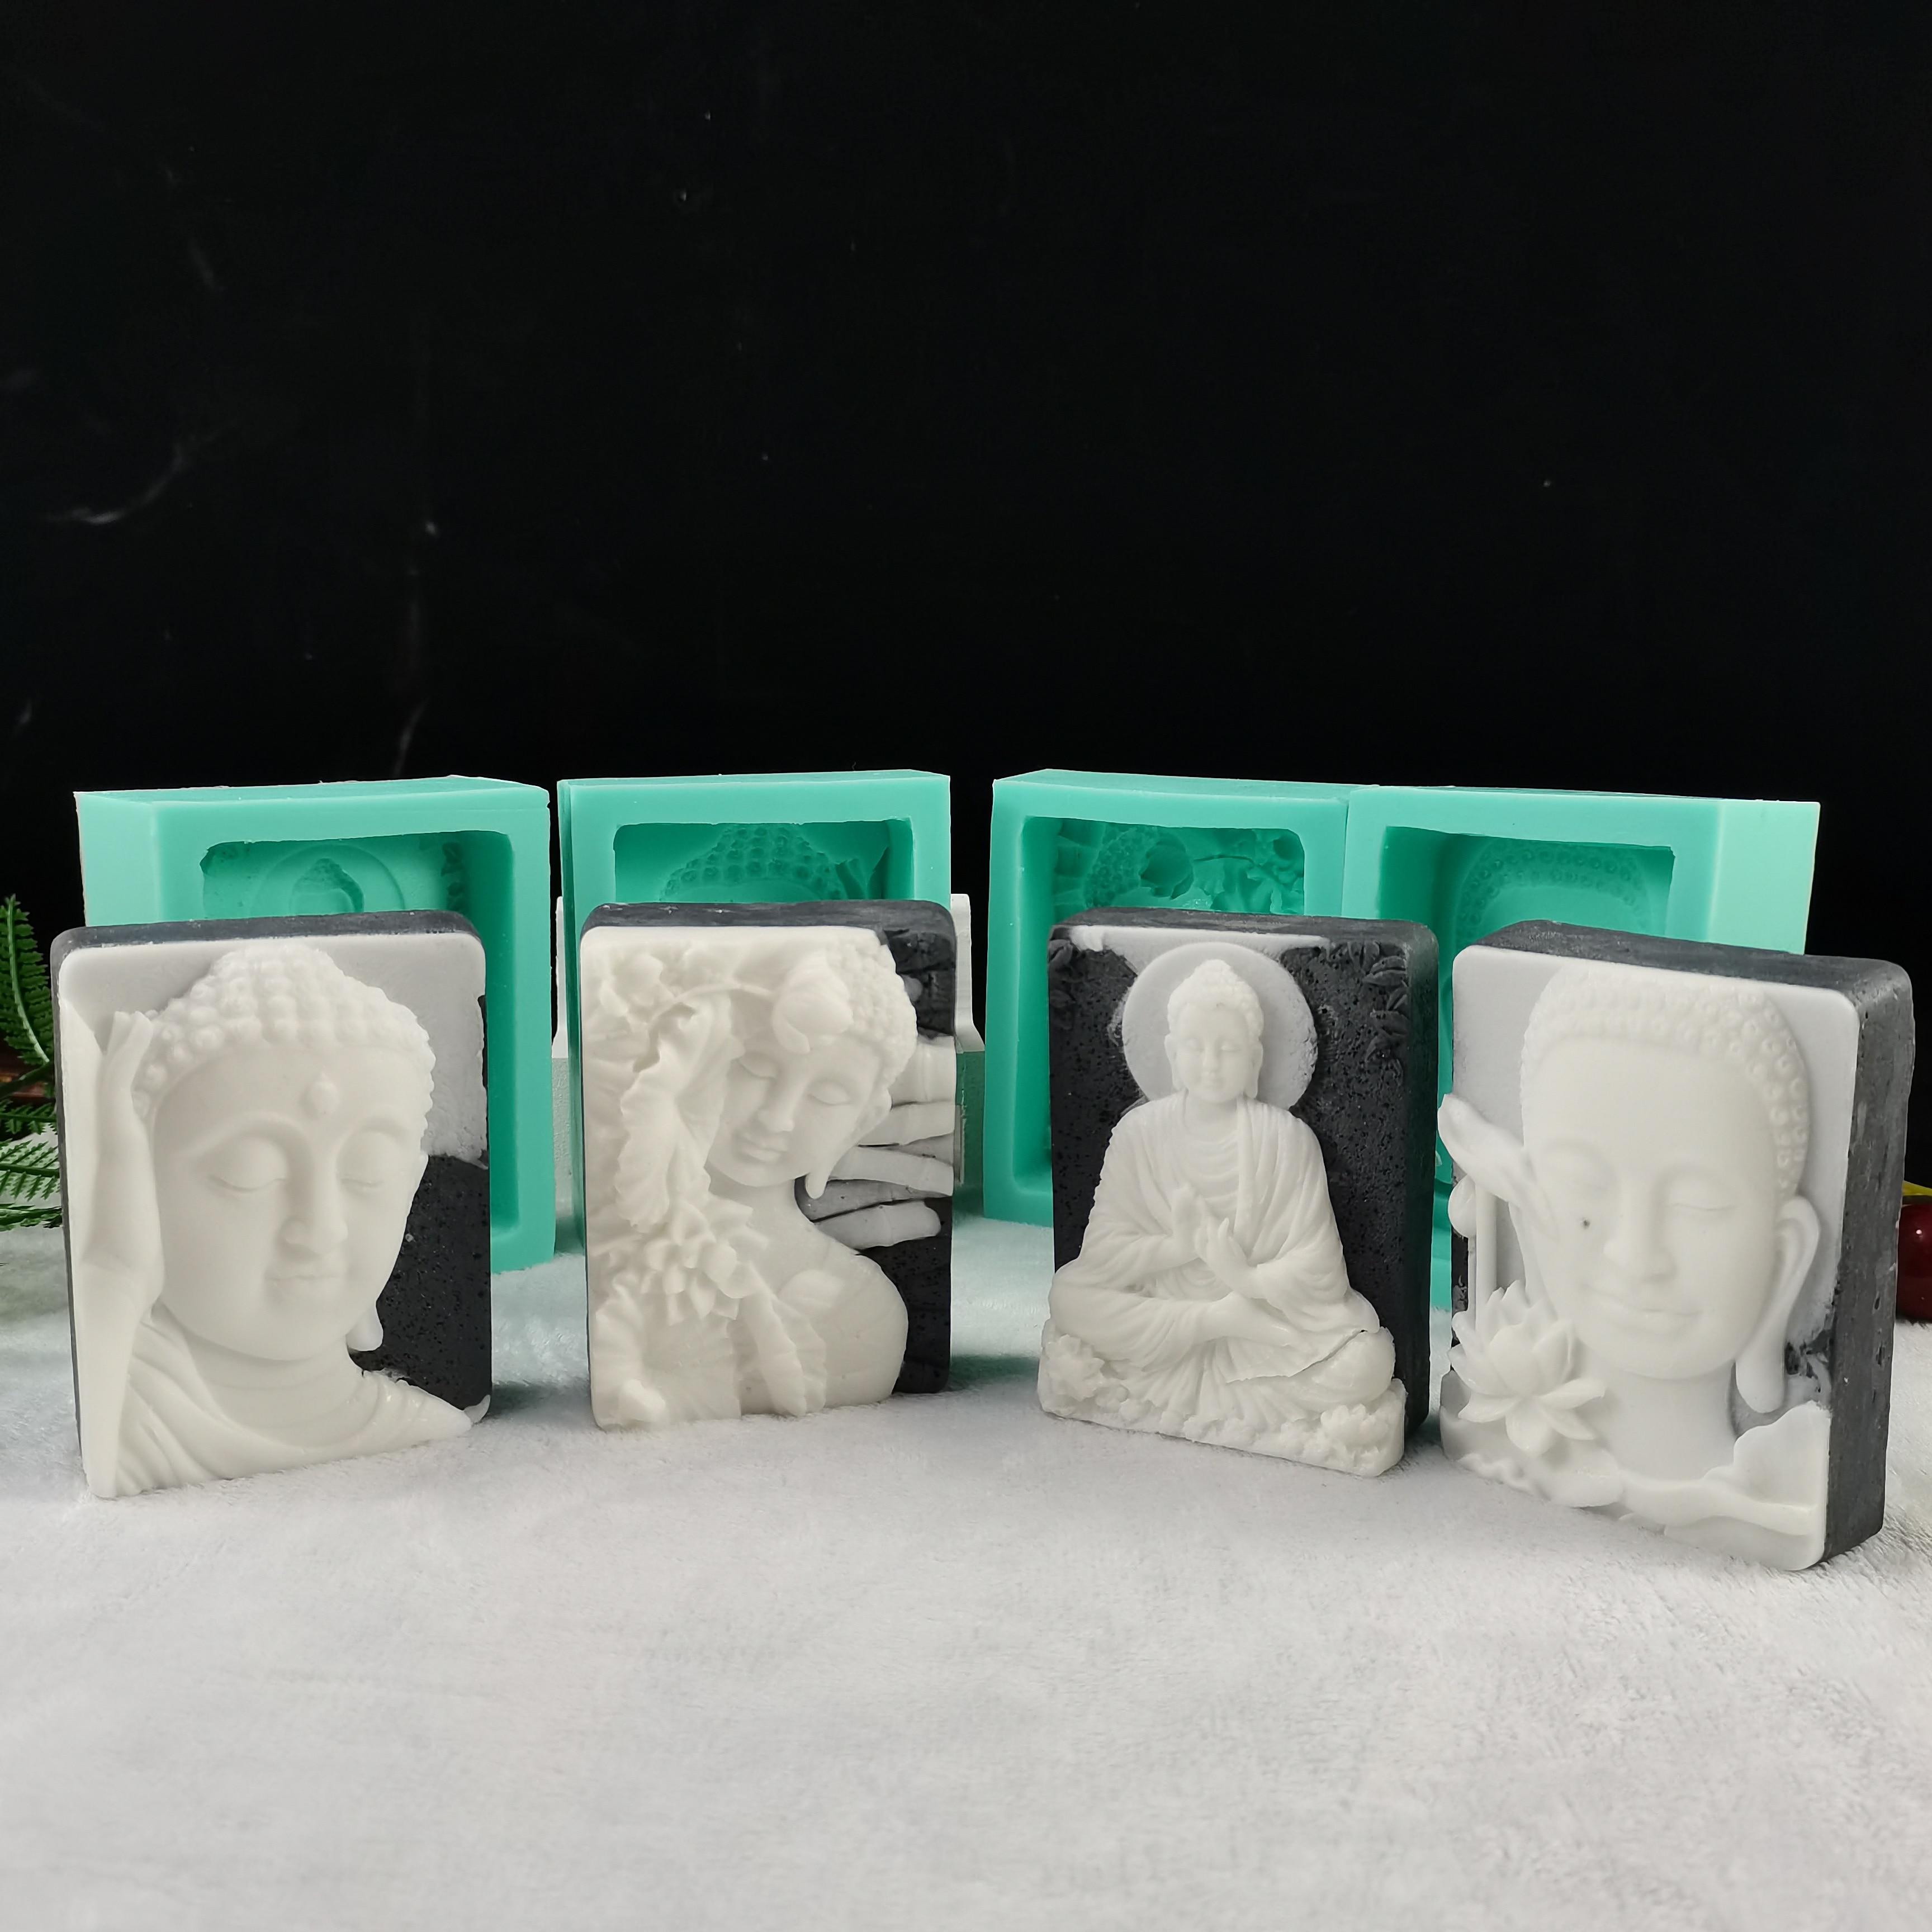 2D Silicone Buddha Mold Handmade  gypsum Buddha Statue Plaster Soap Mould DIY Home Decorative Tool